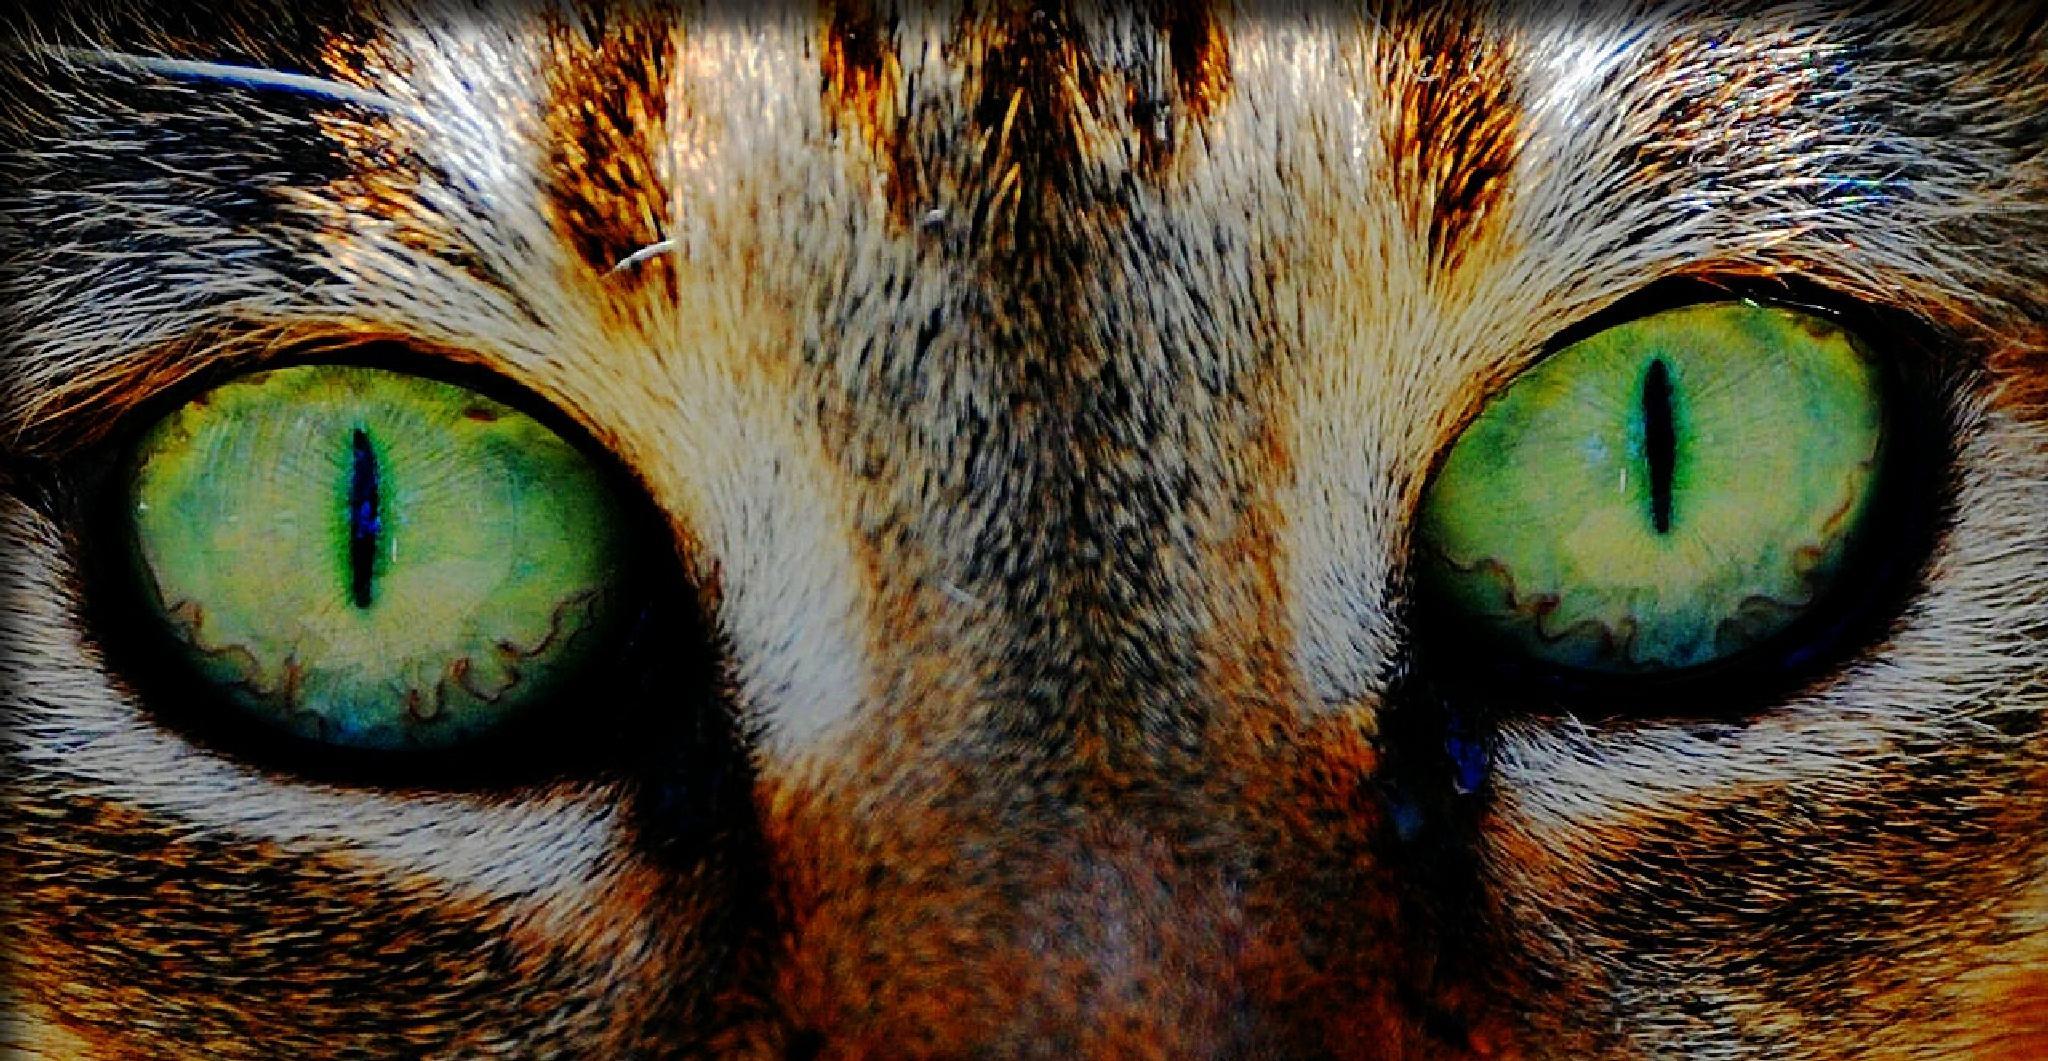 Cat Eyes by Cheryl Rendino